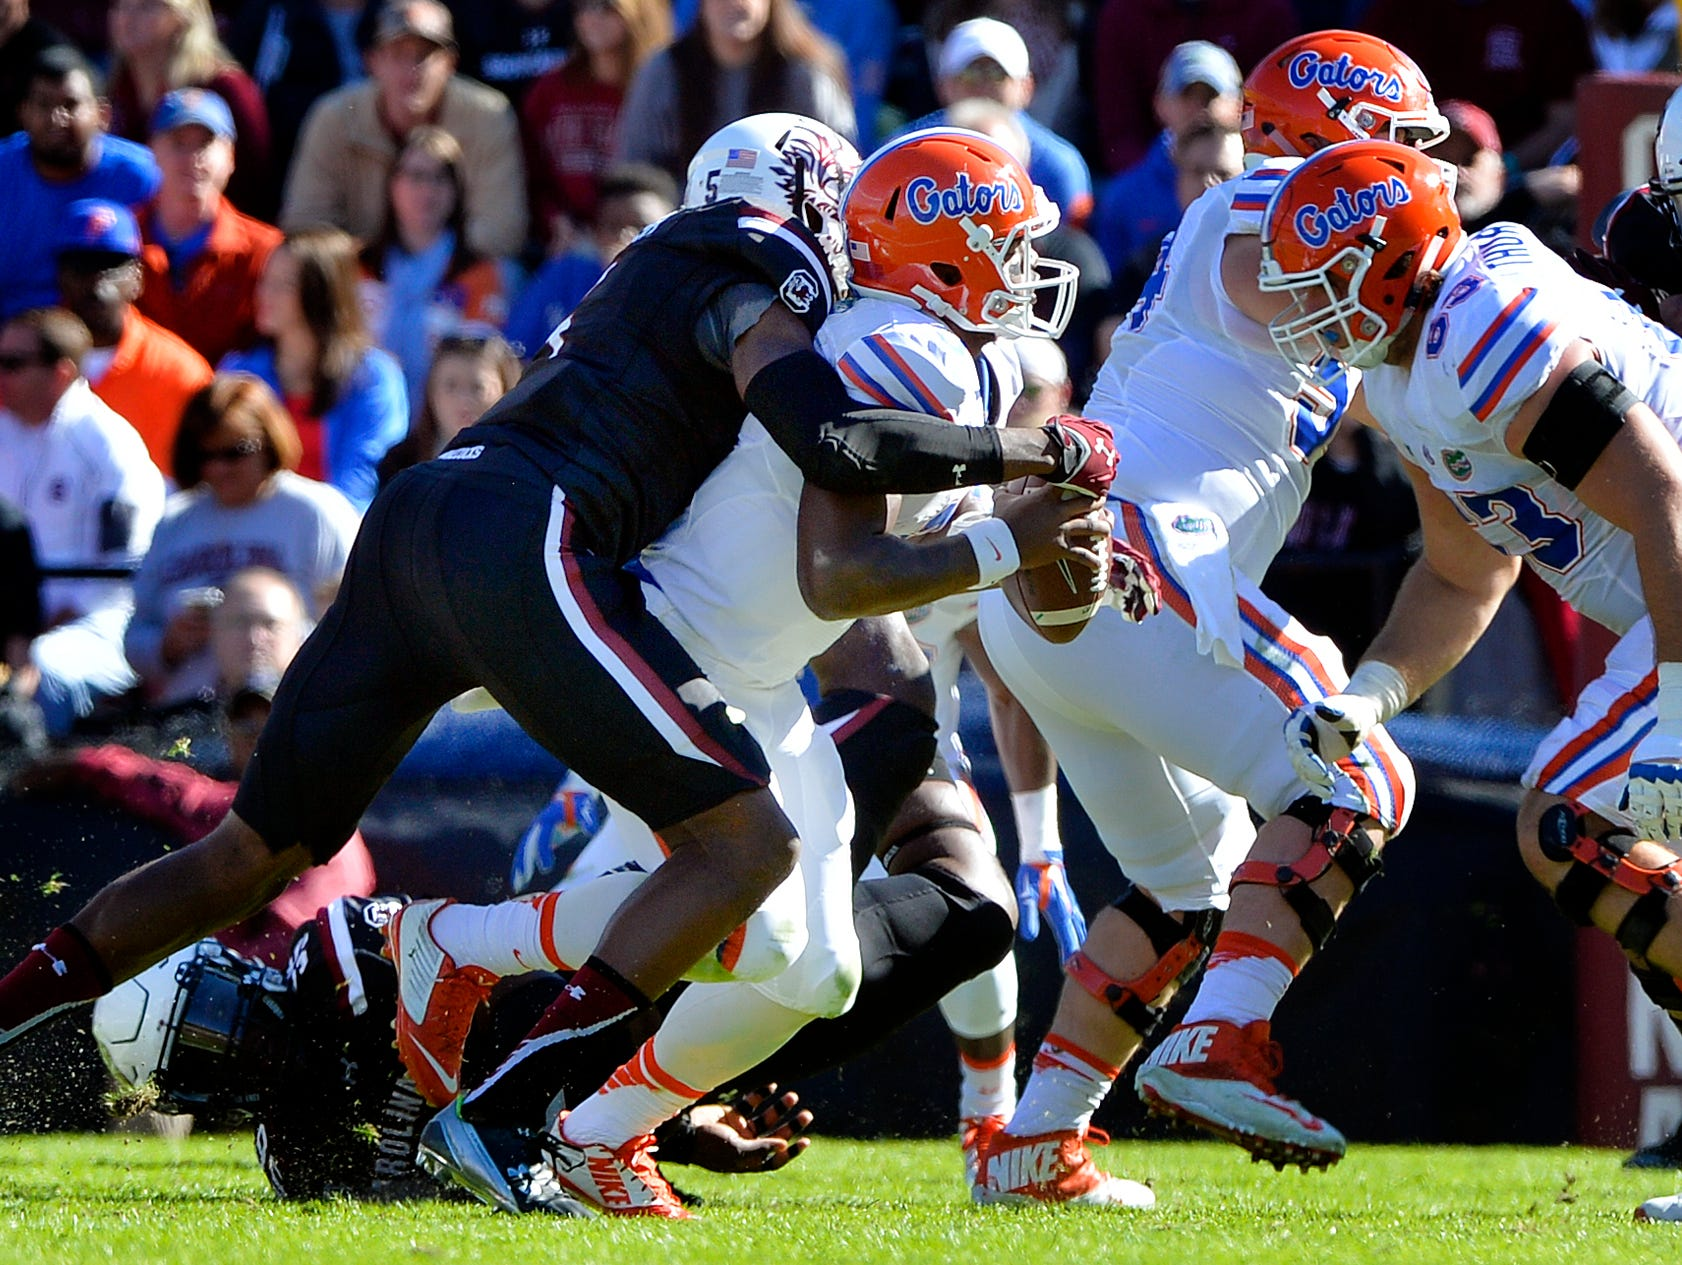 USC defensive end Darius English (5) sacks Florida quarterback Treon Harris (3) late in the first half at Williams-Brice Stadium in Columbia on Nov. 14, 2015.